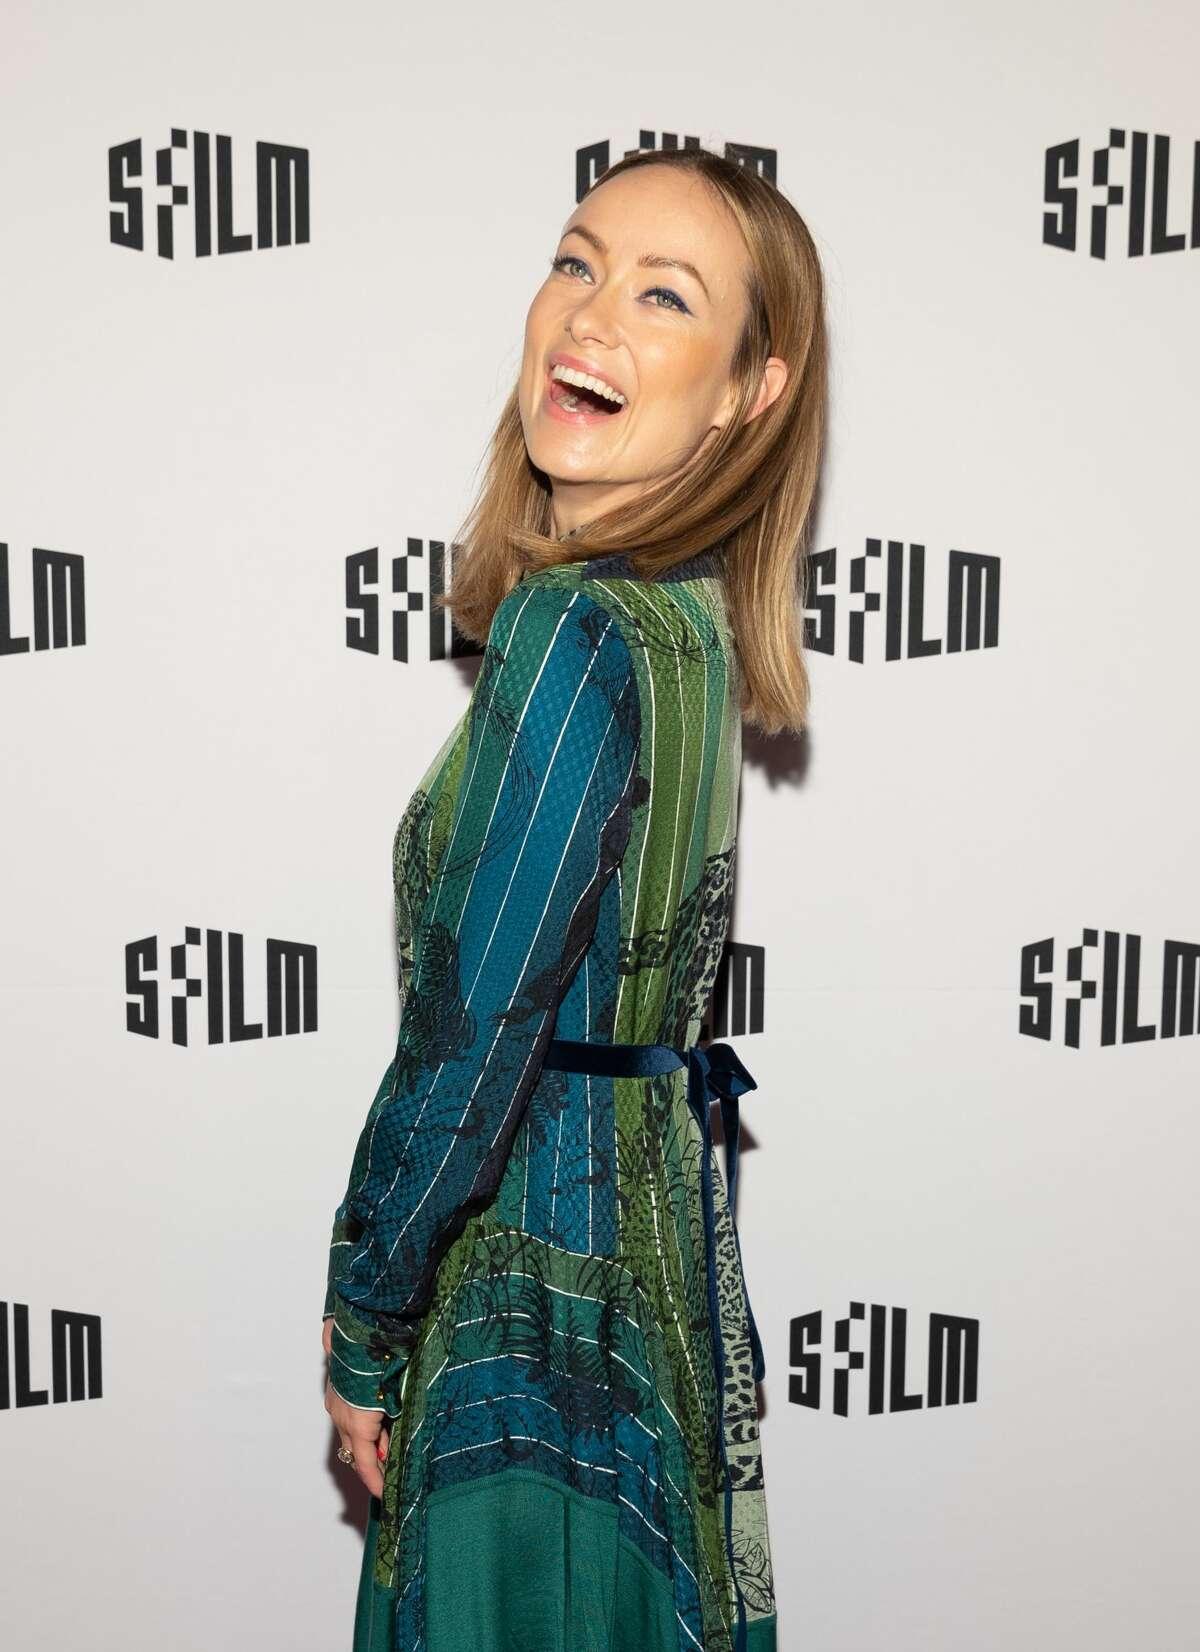 Olivia Wilde attends SFFILM Festival 2019 Red Carpet Arrivals for 'Booksmart' on April 16th 2019 at Castro Theatre in San Franciso, CA (Photo - Drew Altizer)